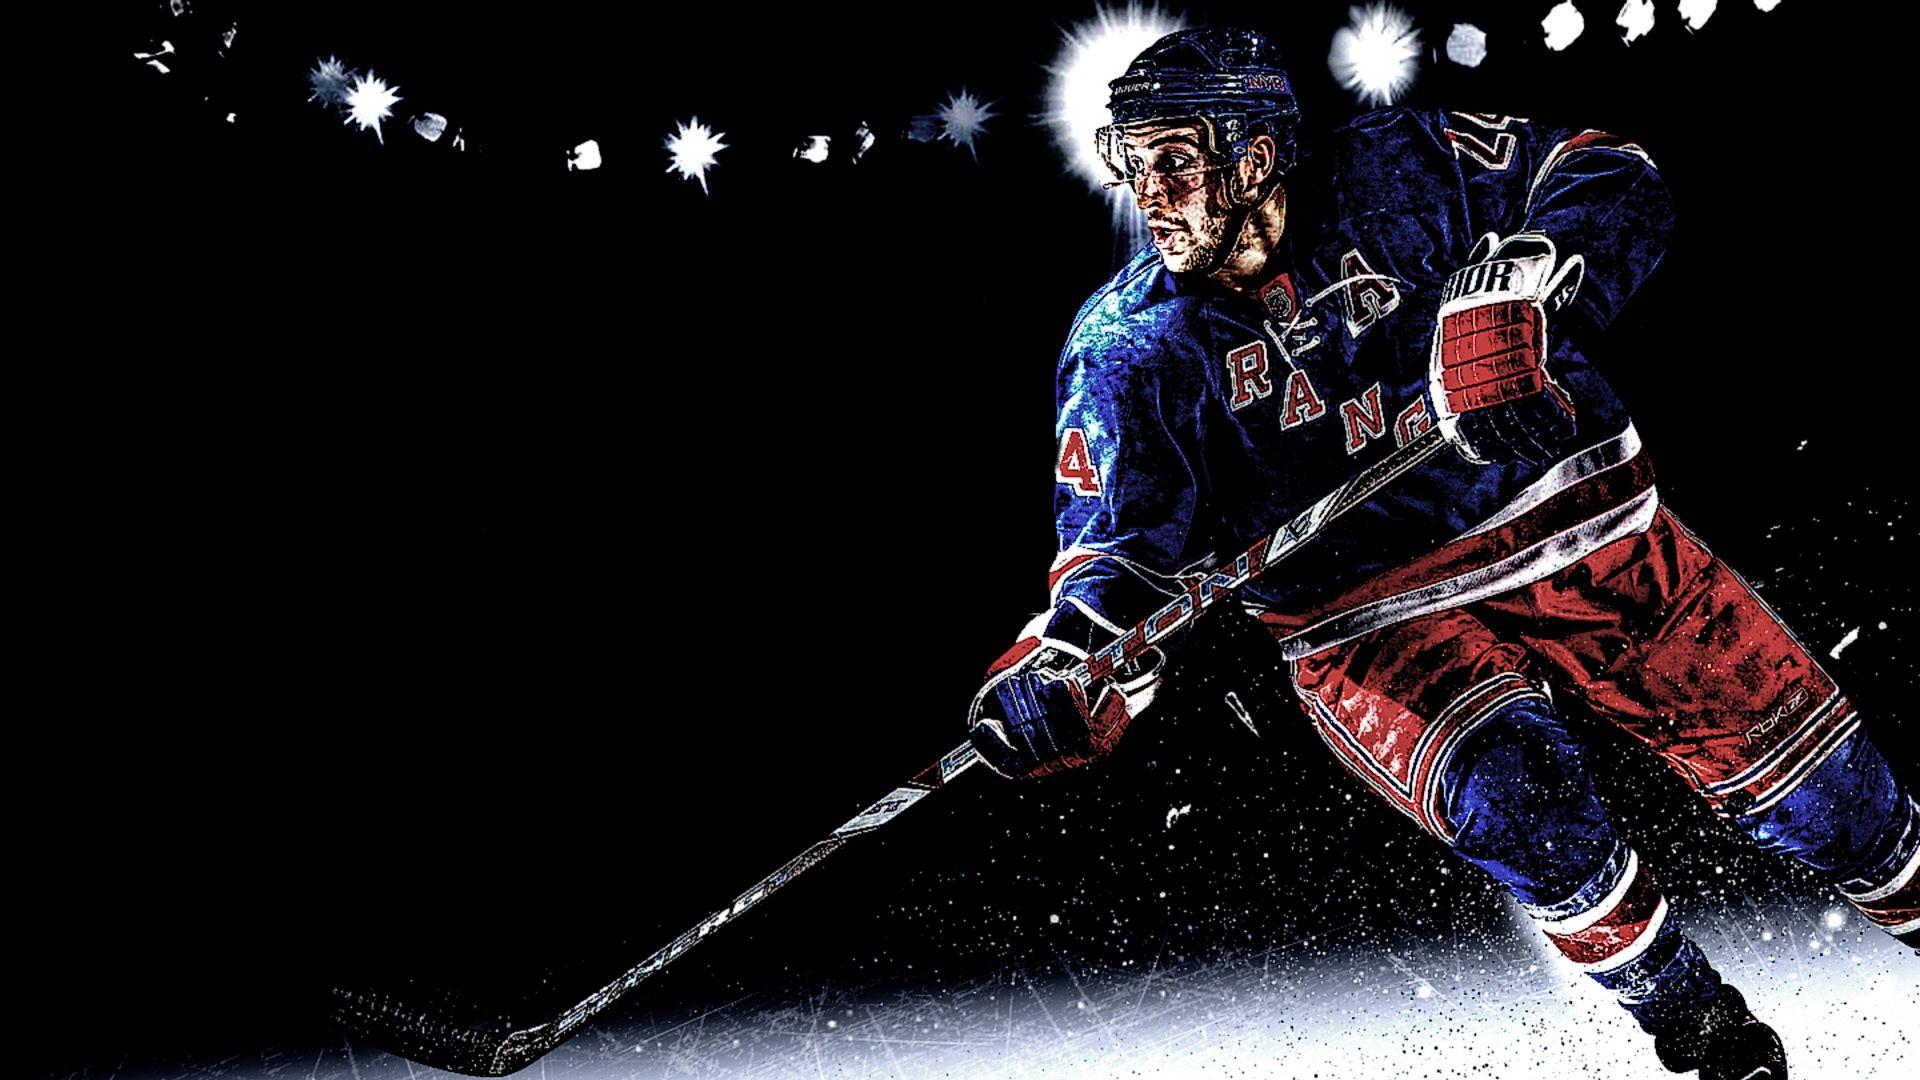 Rangers 6 Jpg 1 920 1 080 Pixels Hockey Pictures New York Rangers Hockey